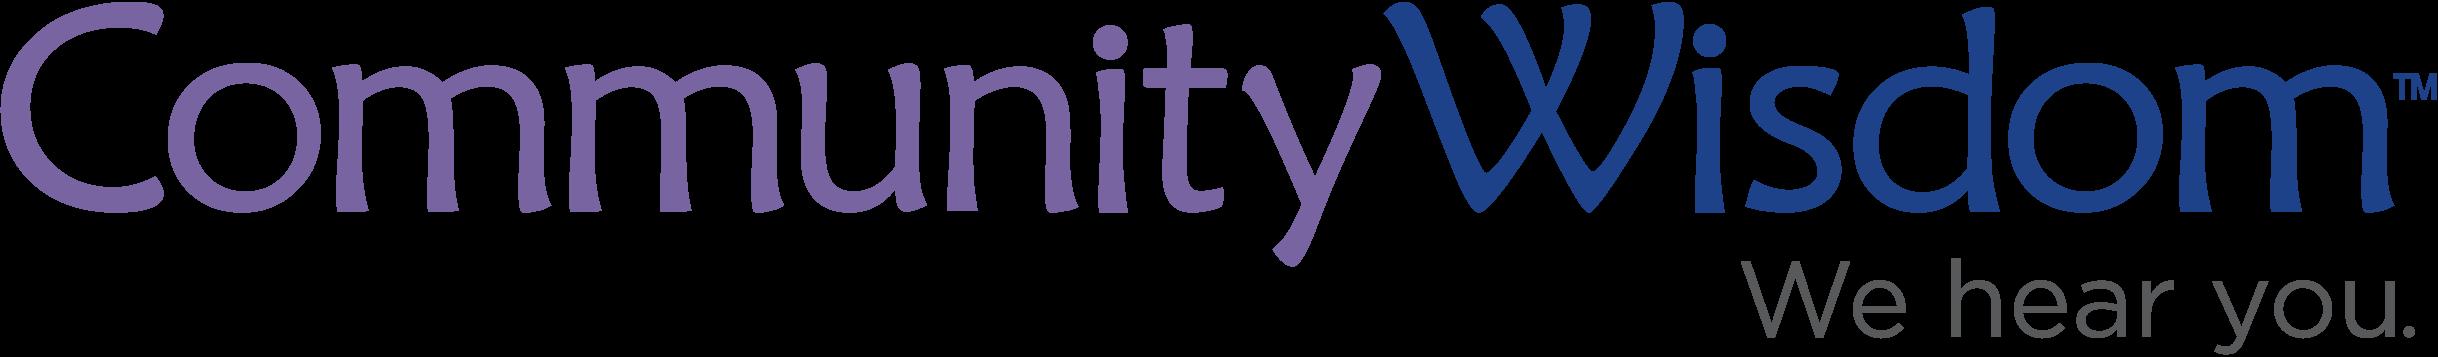 community engagement software solutions | CommunityWisdom